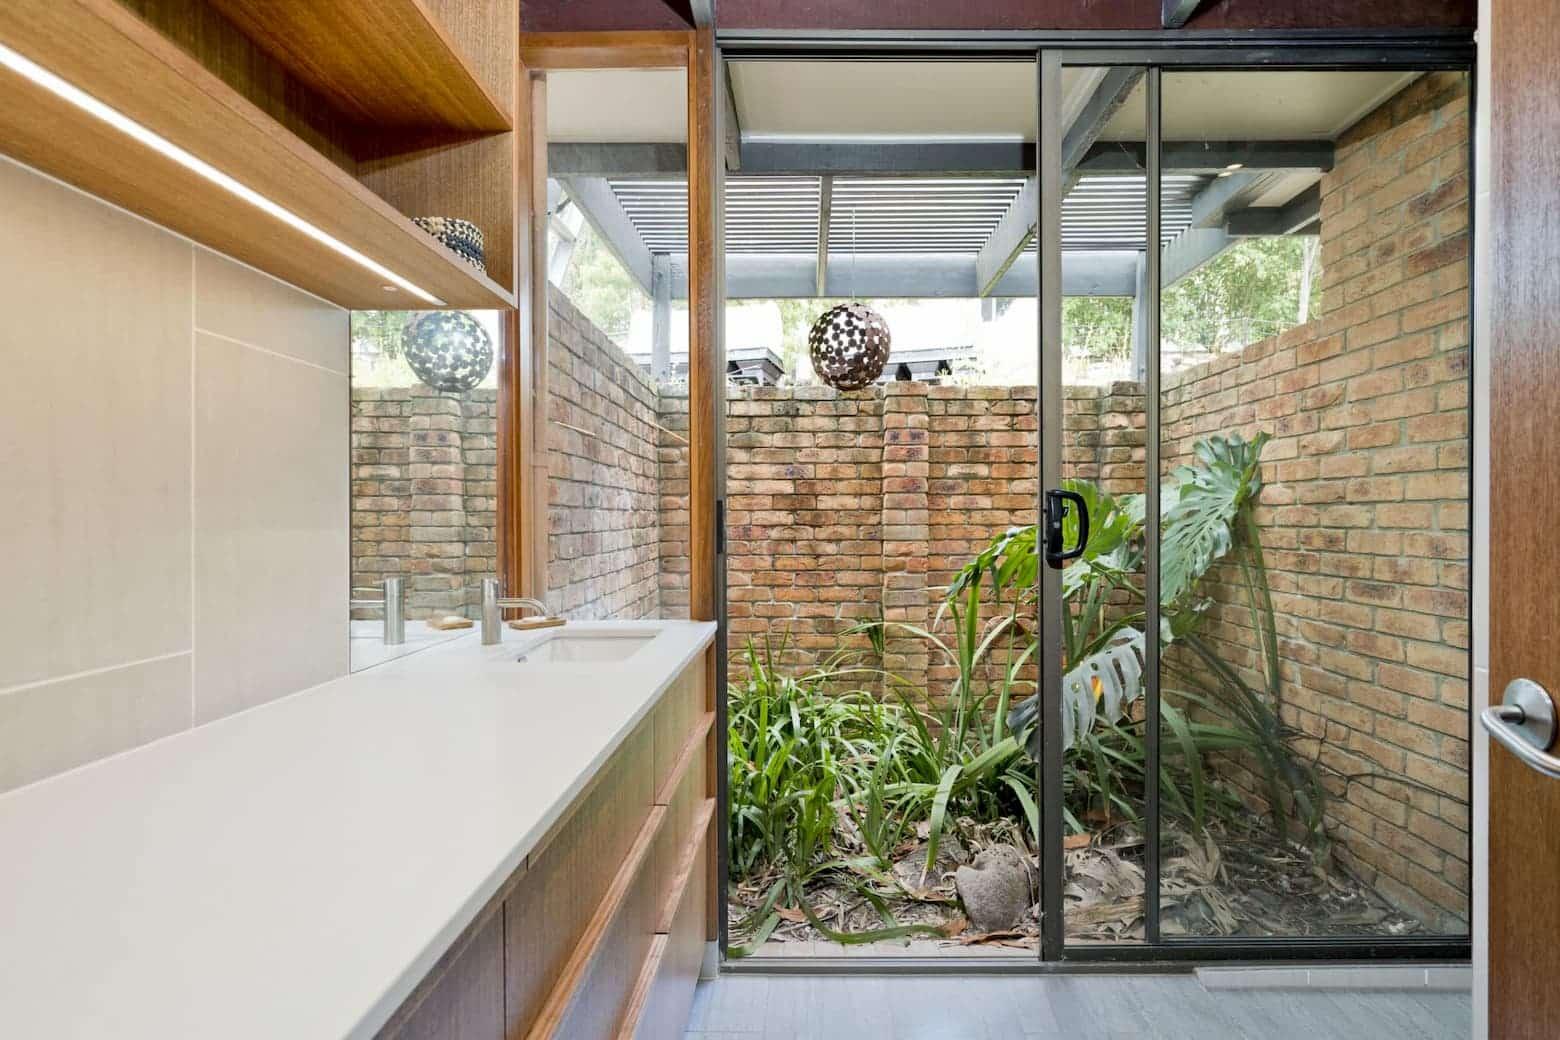 custom bathroom cabinetry - Sunshine Coast Cabinet Makers (1)